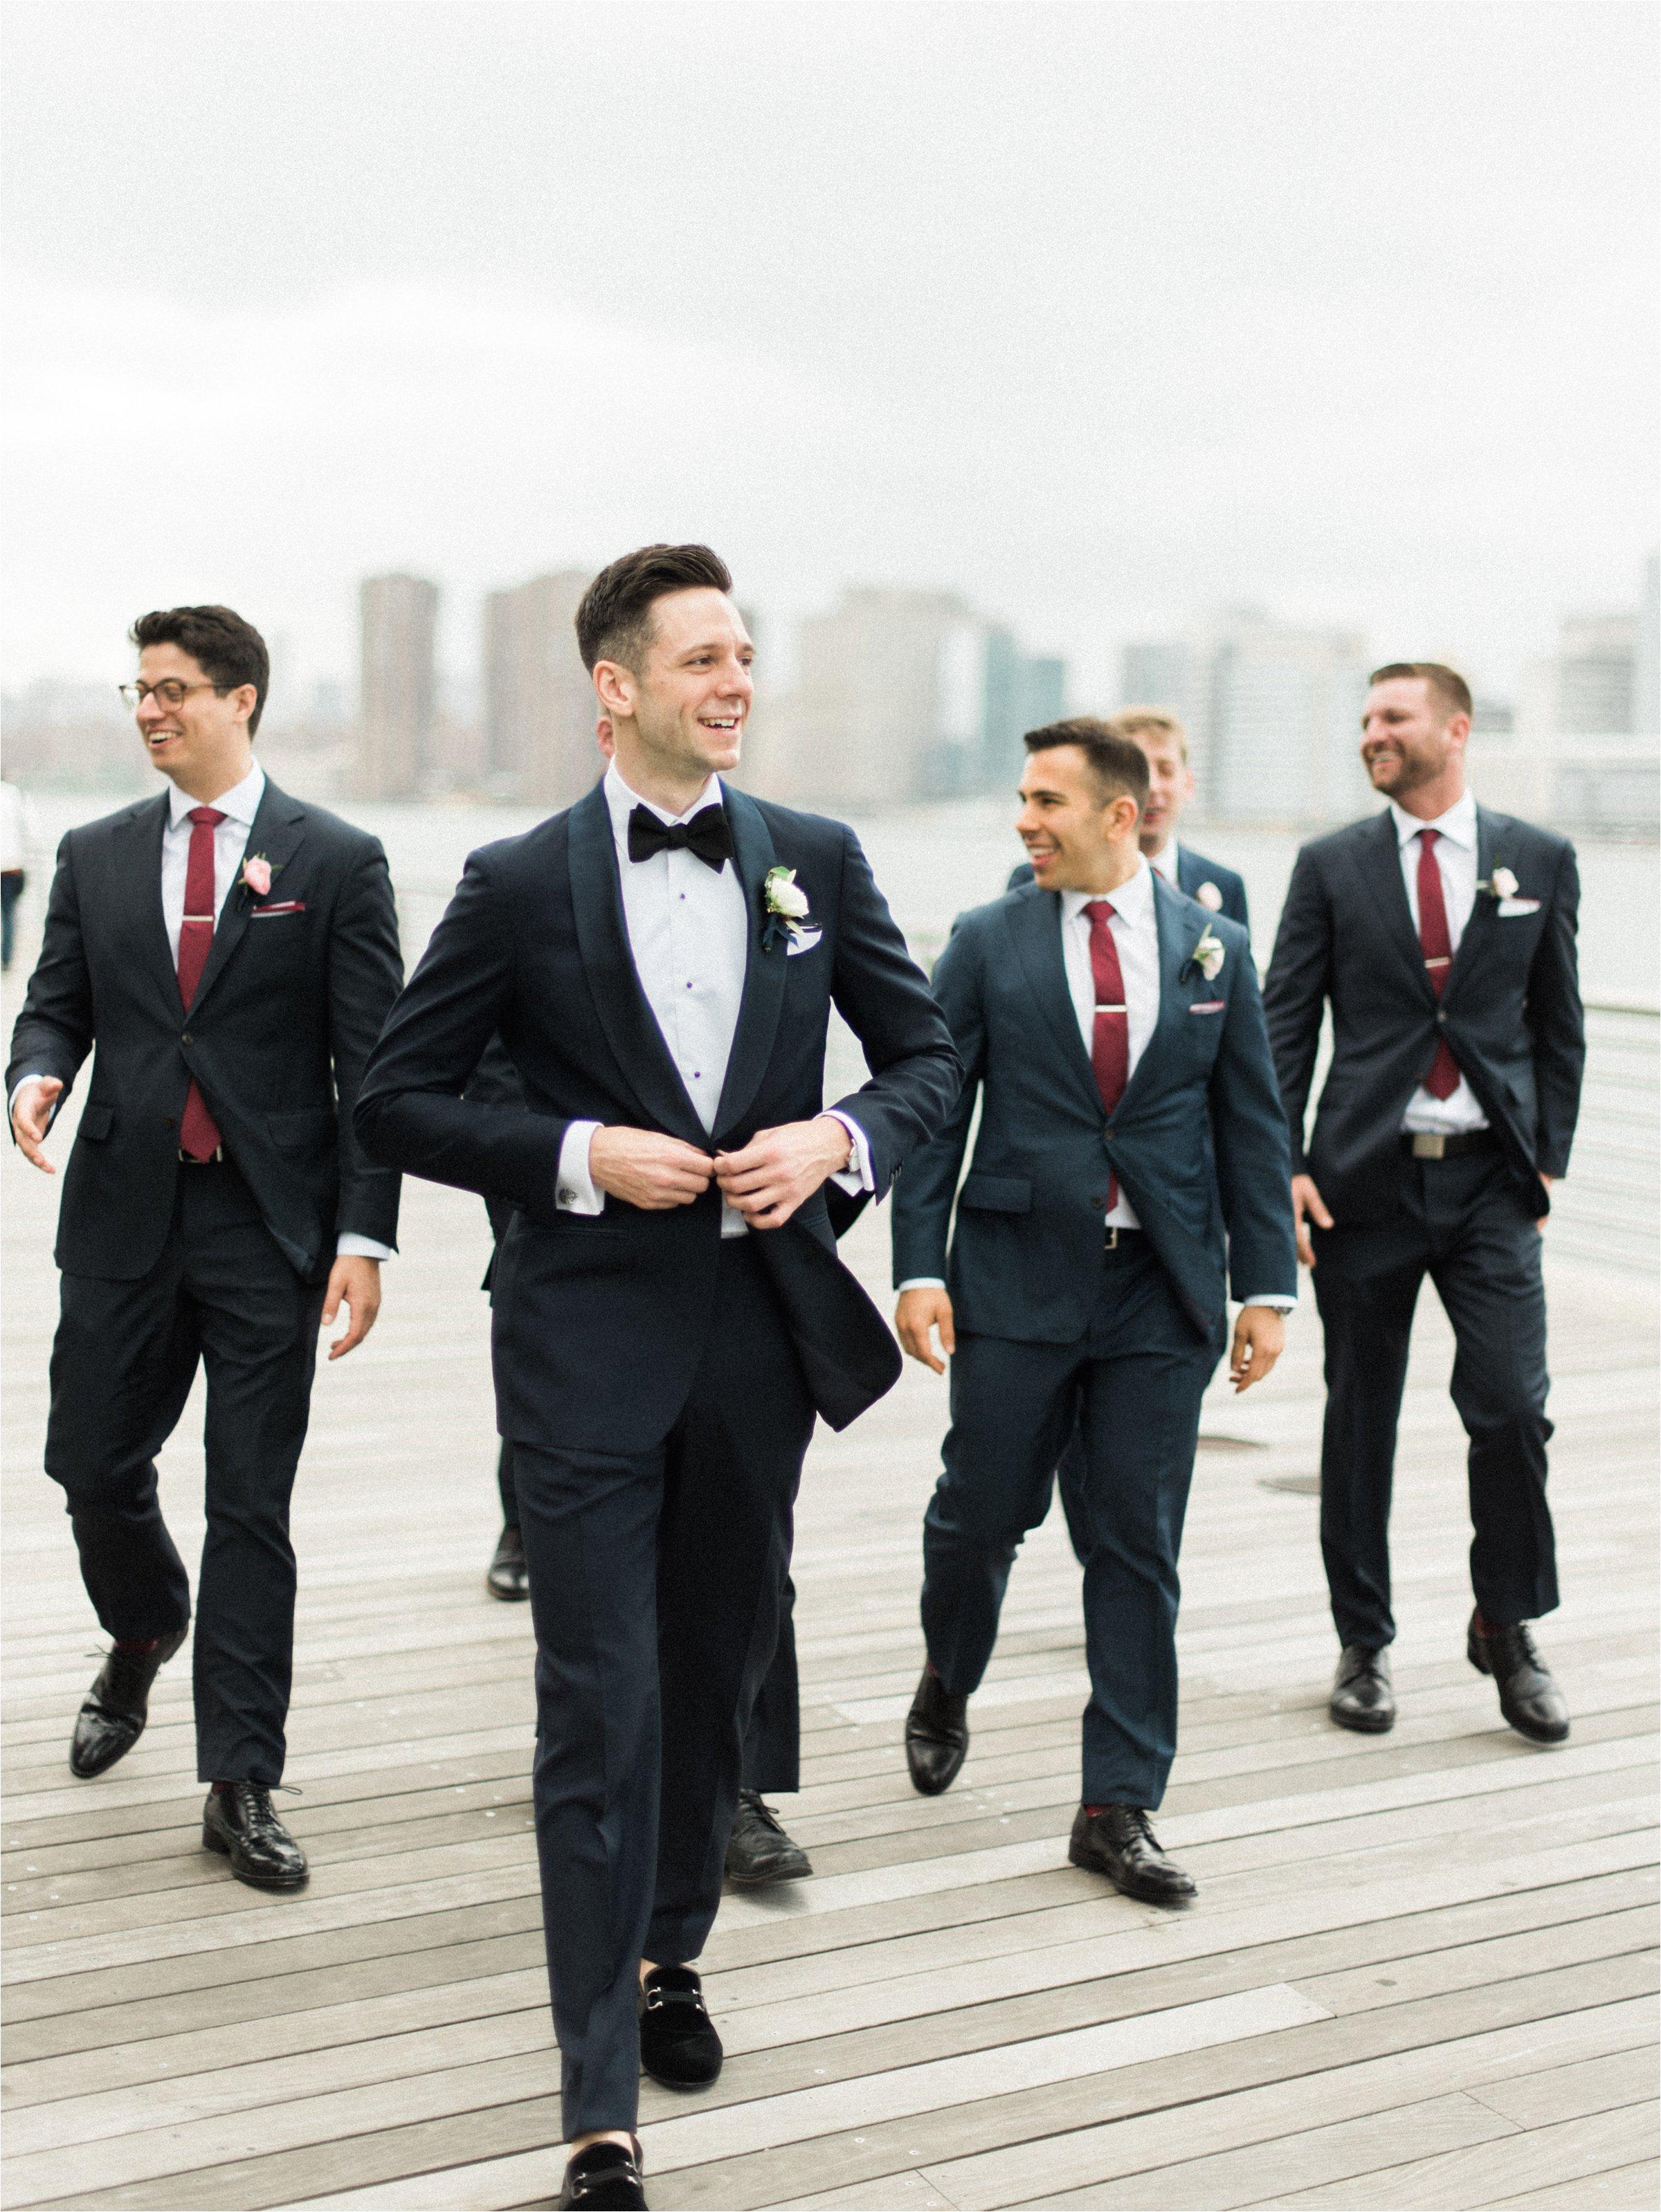 NYC_Wedding_Photographer_Metropolitan_Building2459.JPG